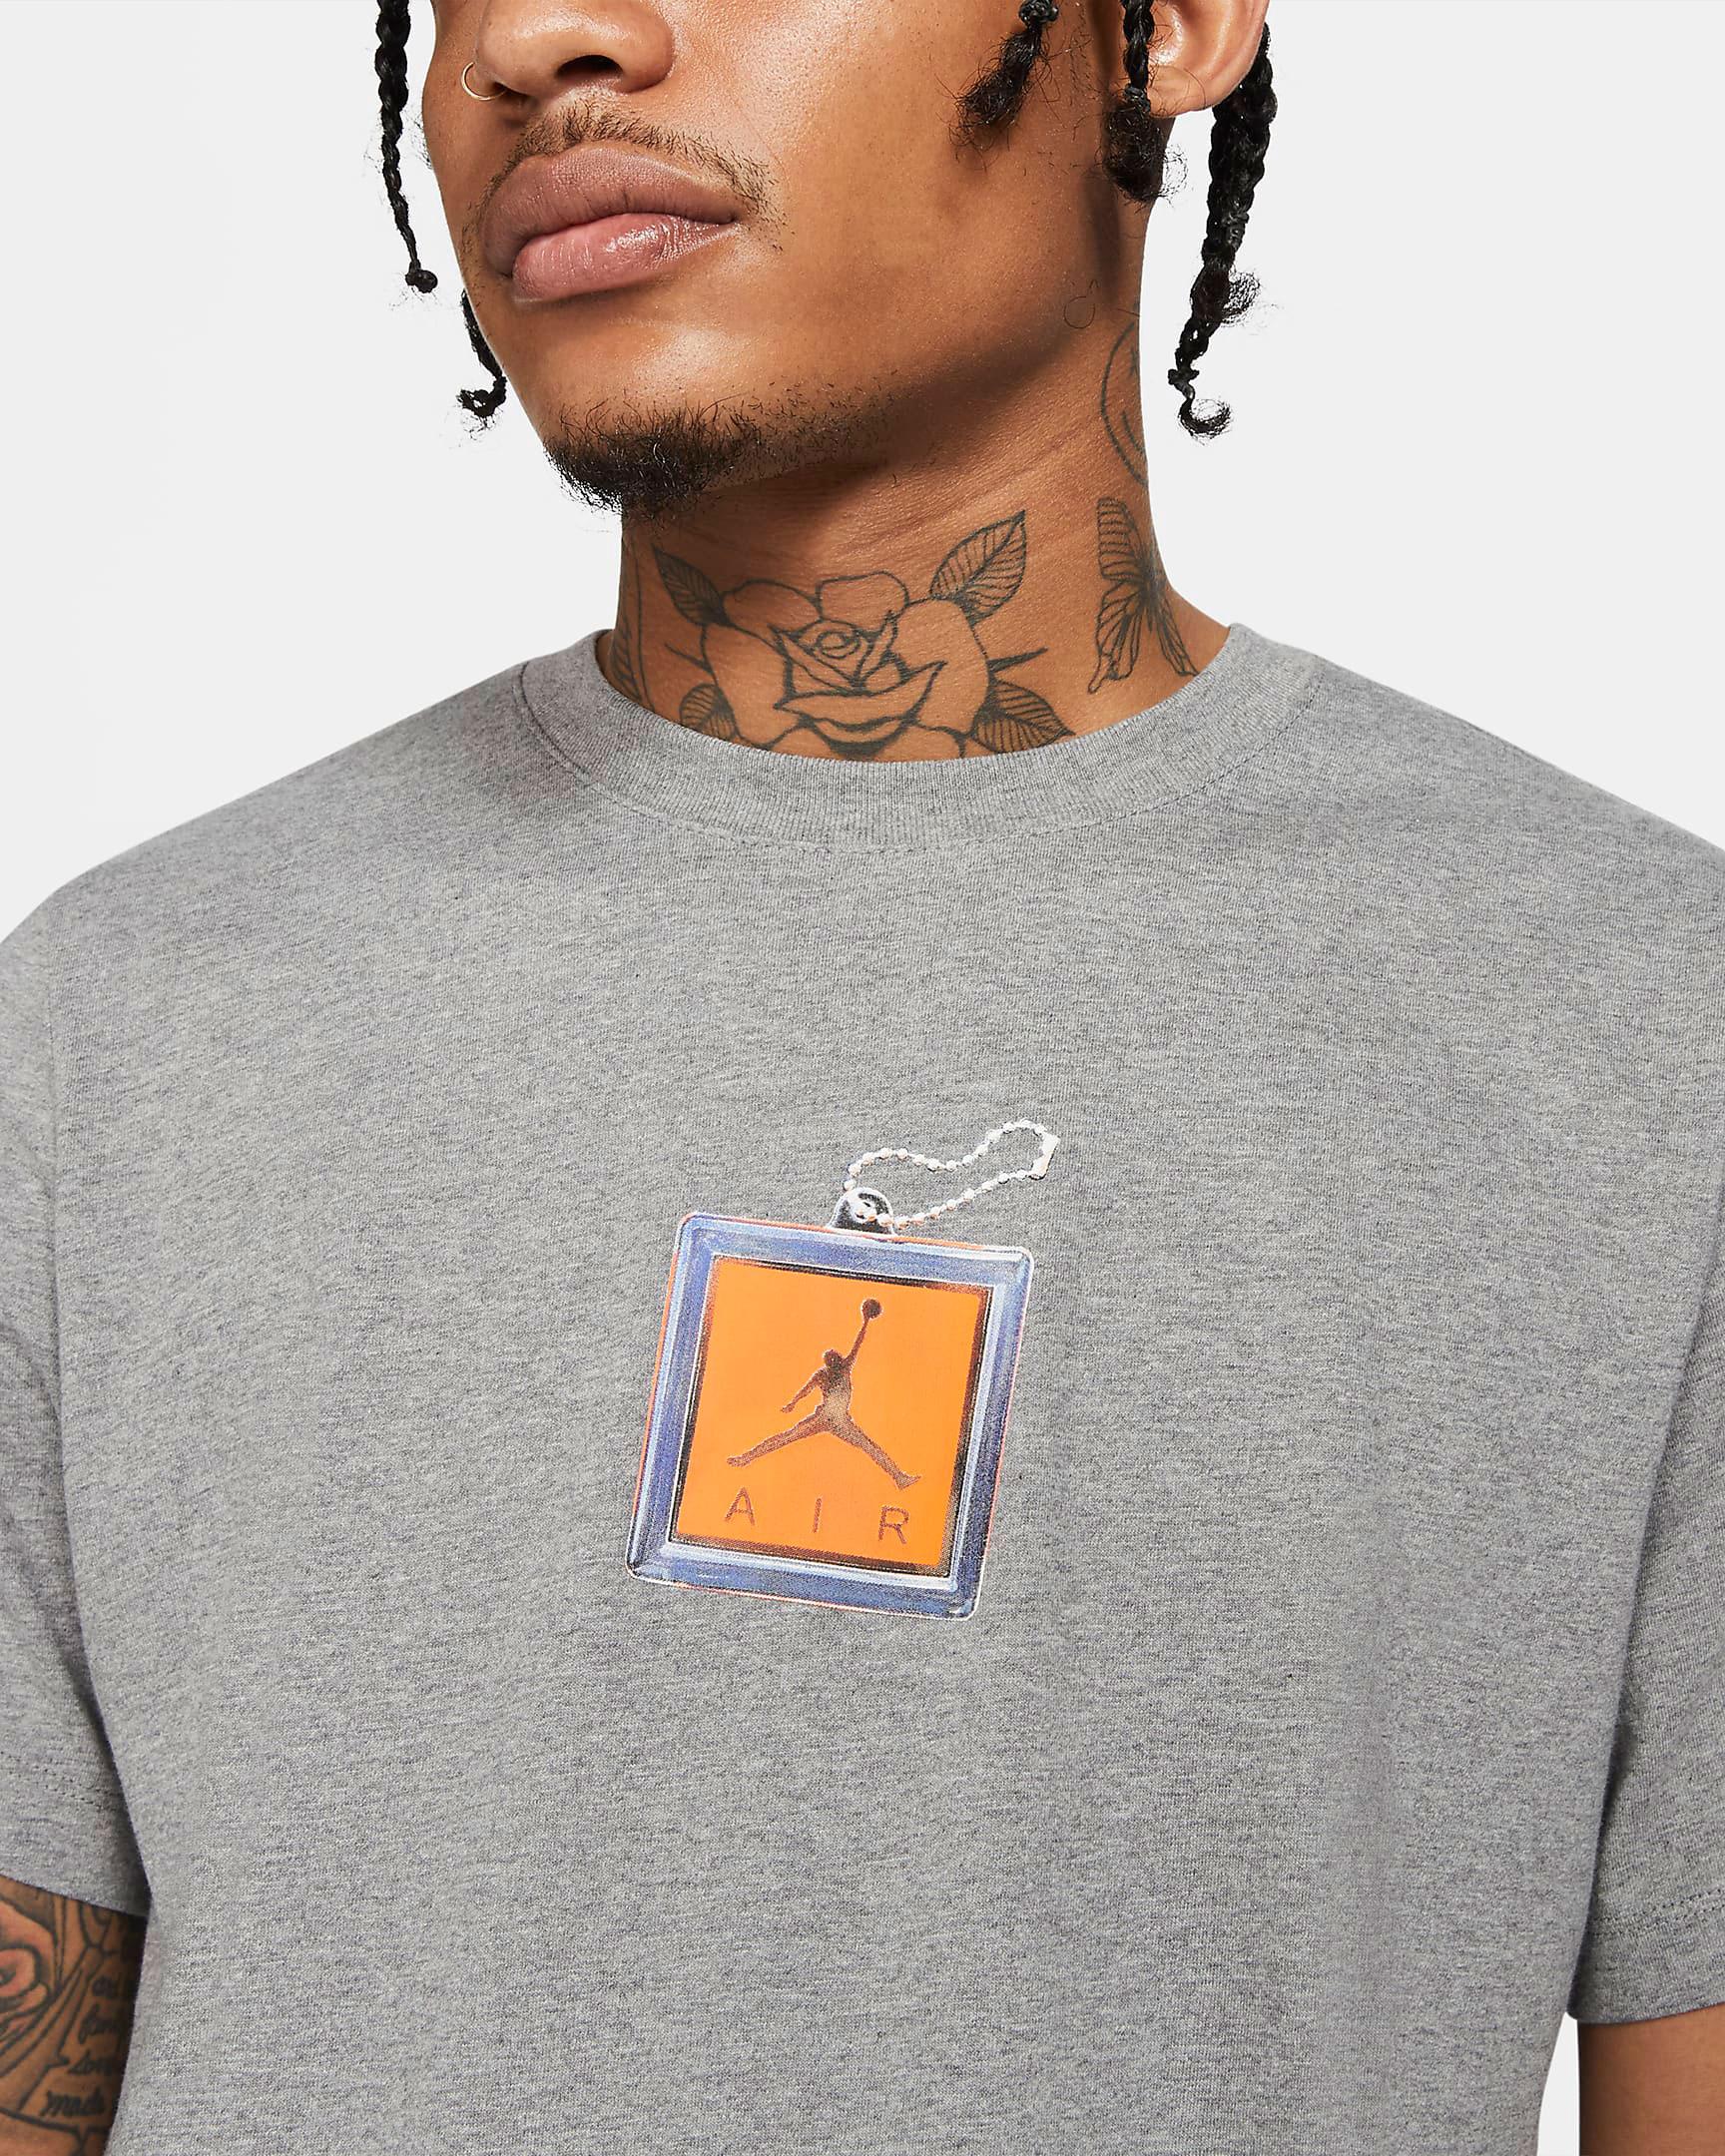 jordan-keychain-shirt-grey-orange-3